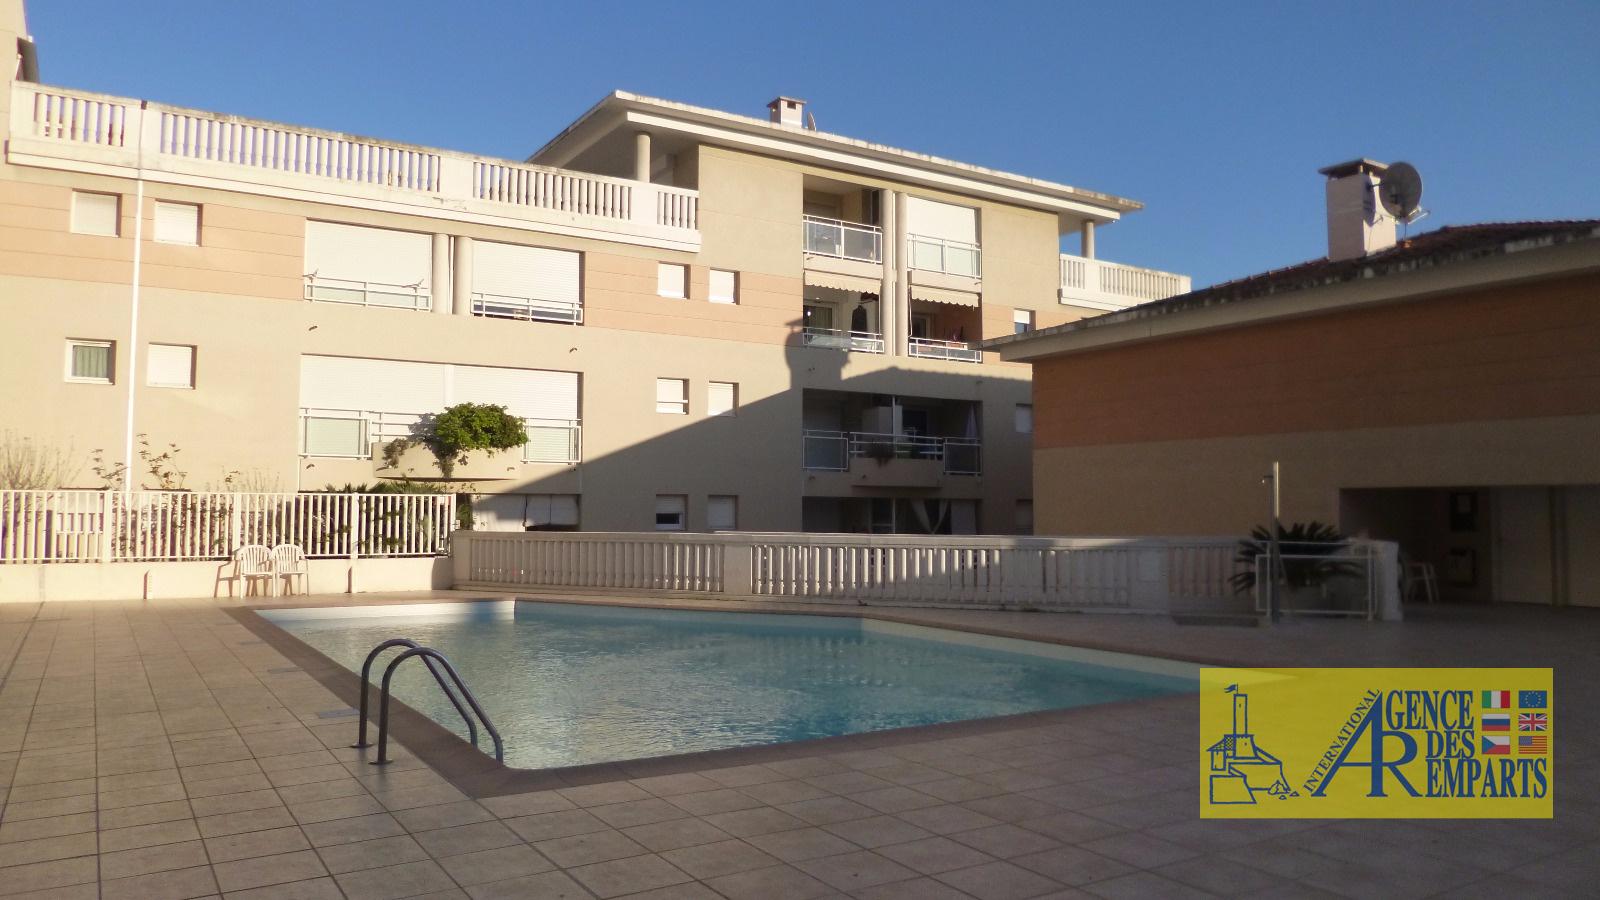 Offres de vente Appartements Golfe Juan 06220